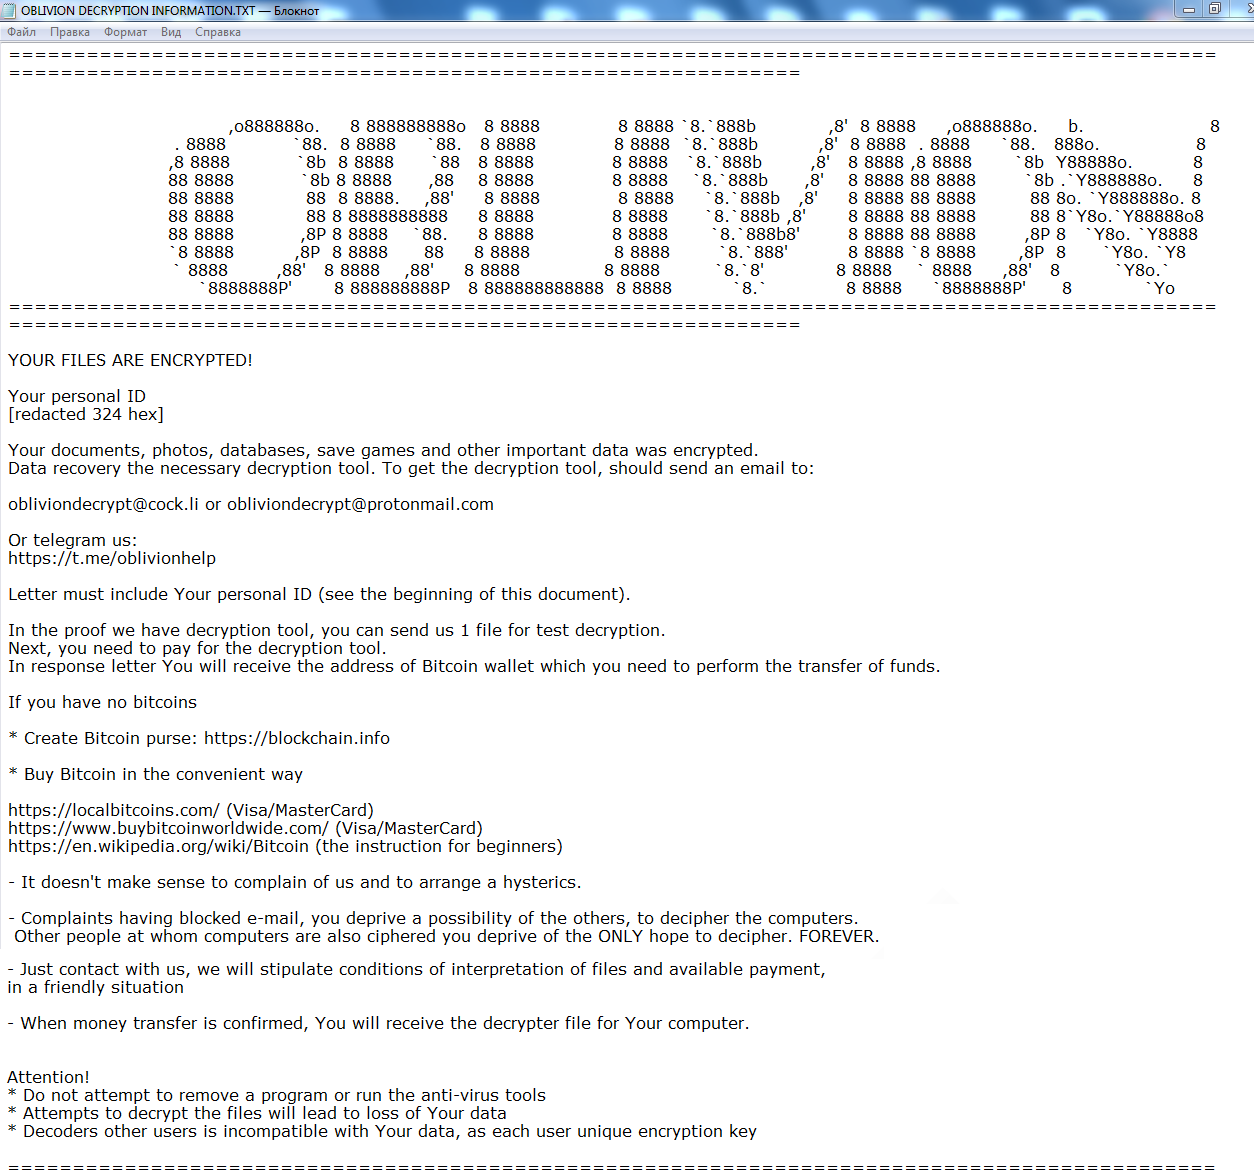 decrypt .Oblivion